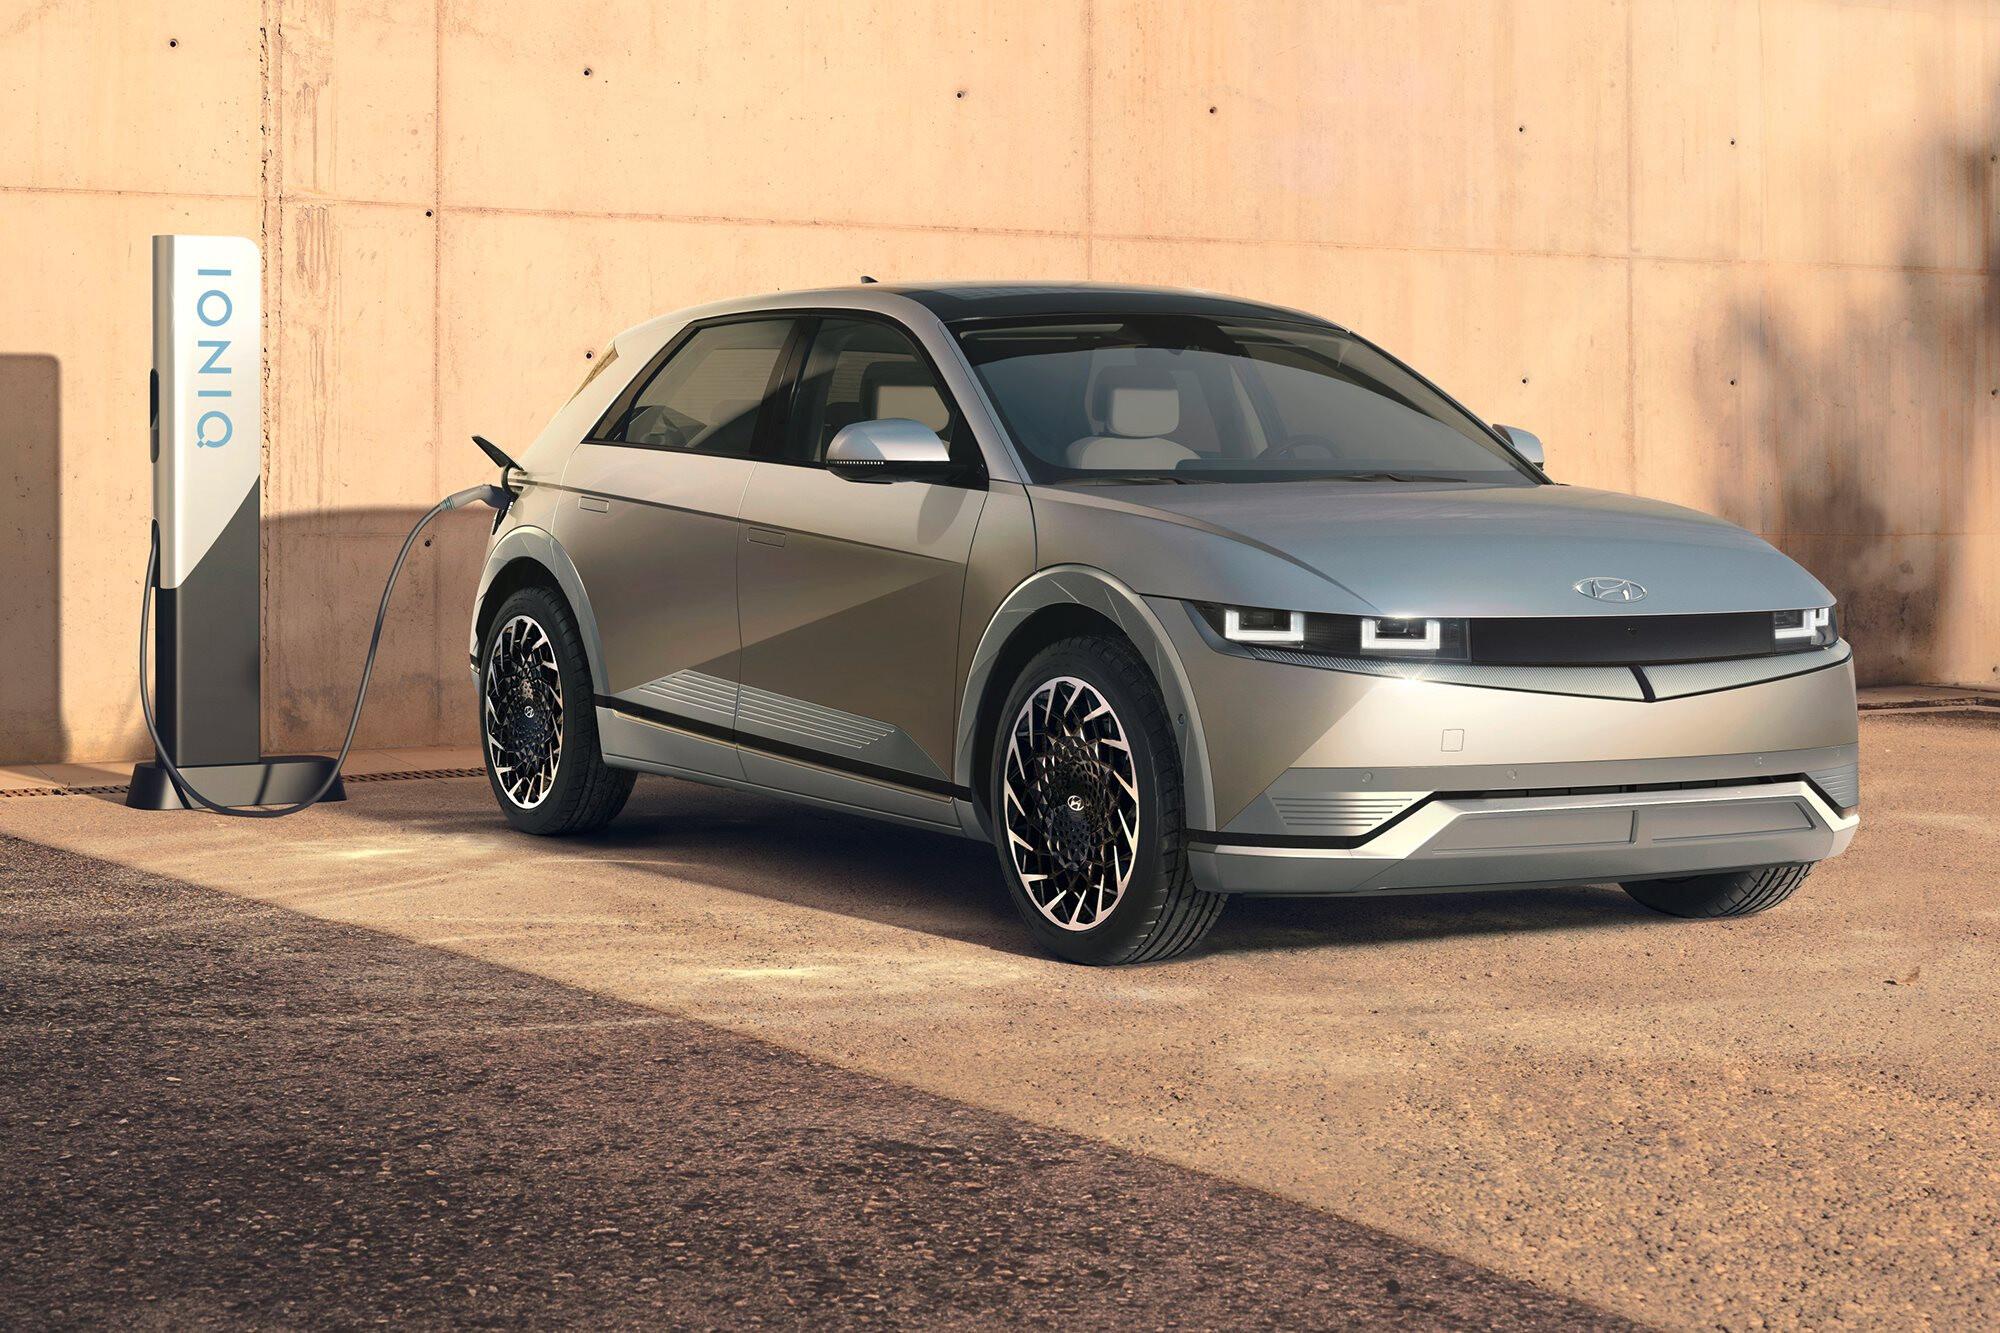 Archive Whichcar 2021 02 23 1 2022 Hyundai Ioniq 5 Electric Vehicle Revealed 1